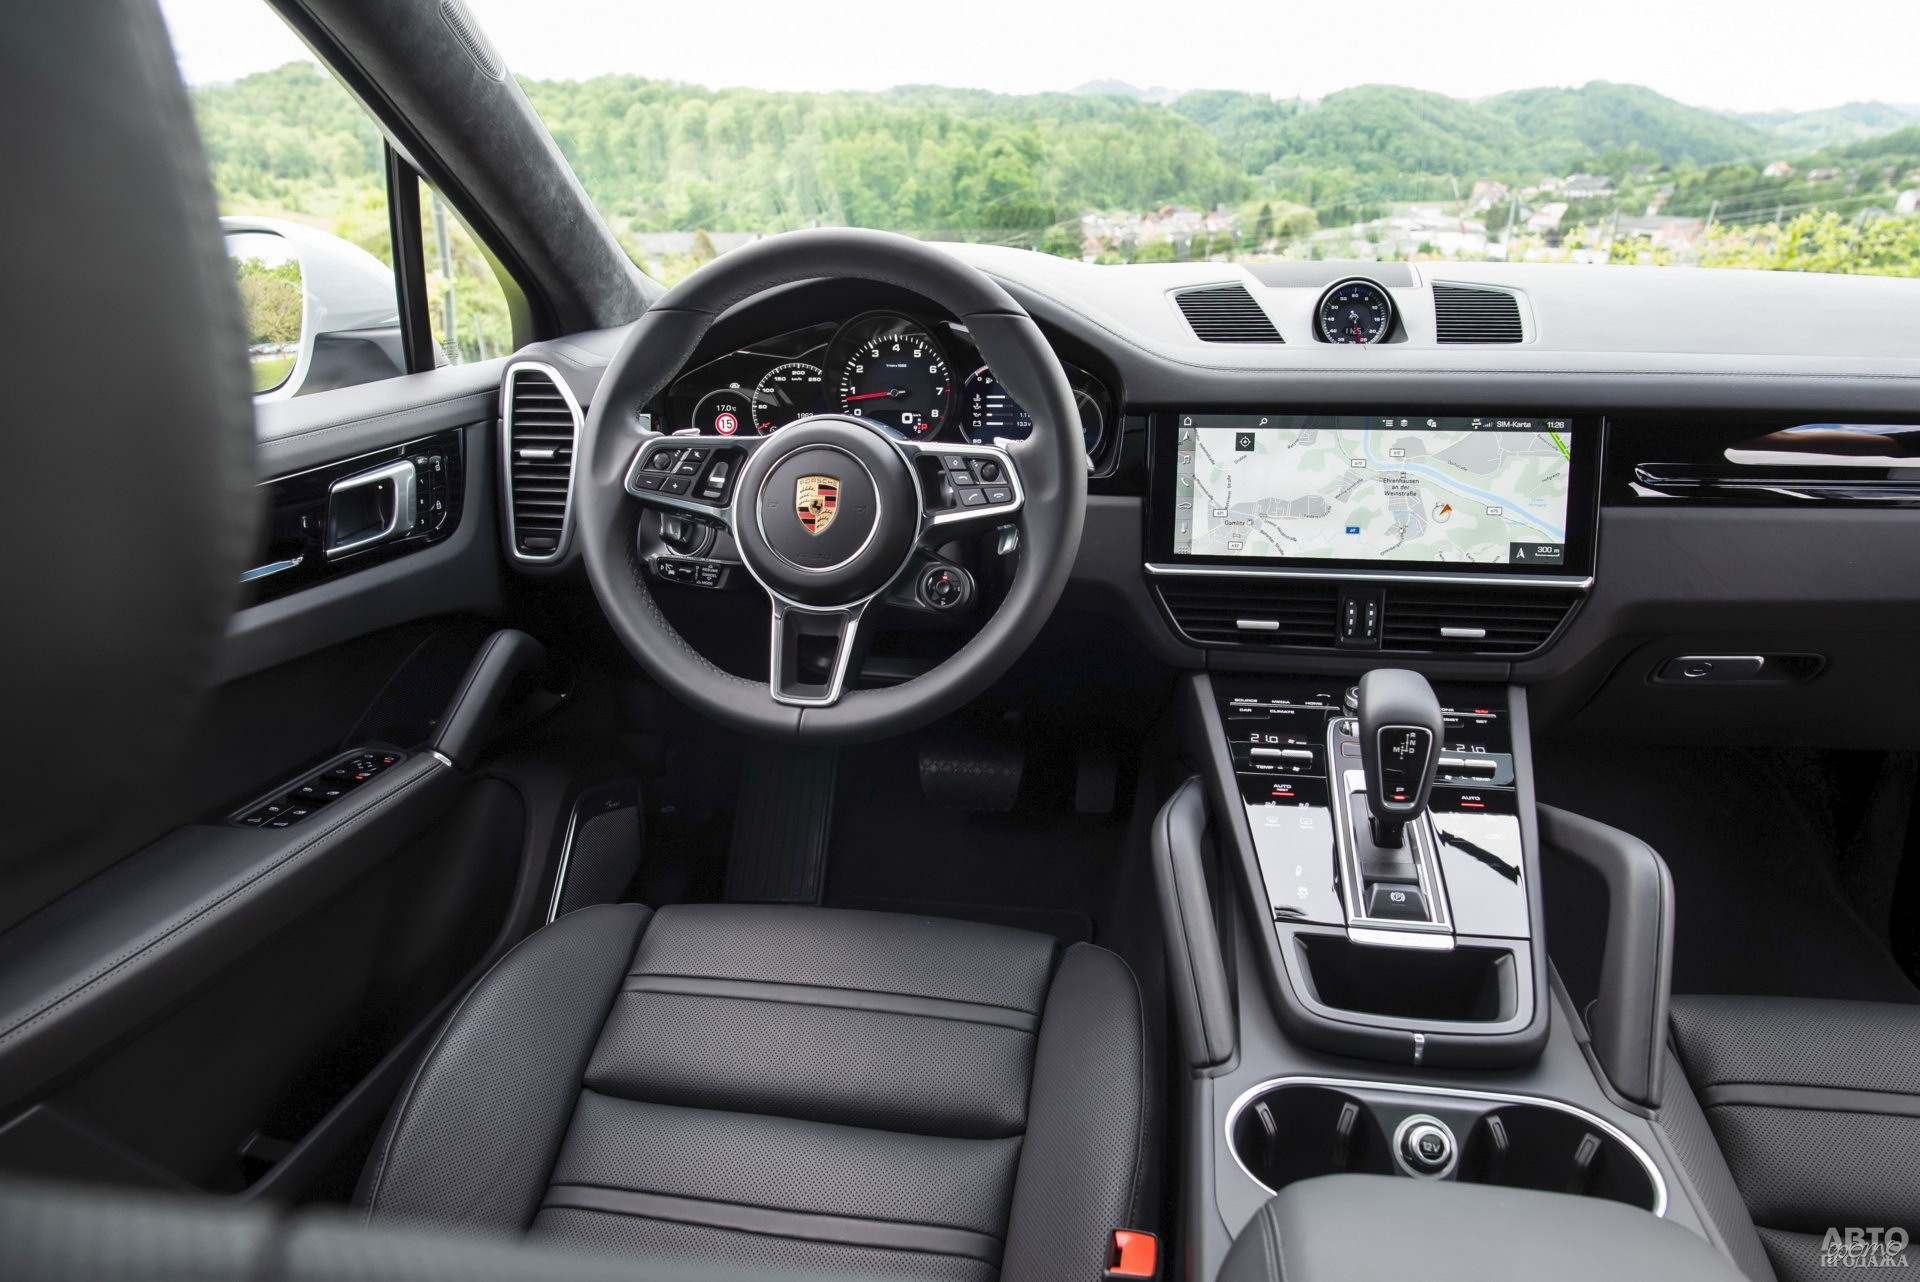 Спидометр на приборной панели Porsche с боков окружен двумя дисплеями